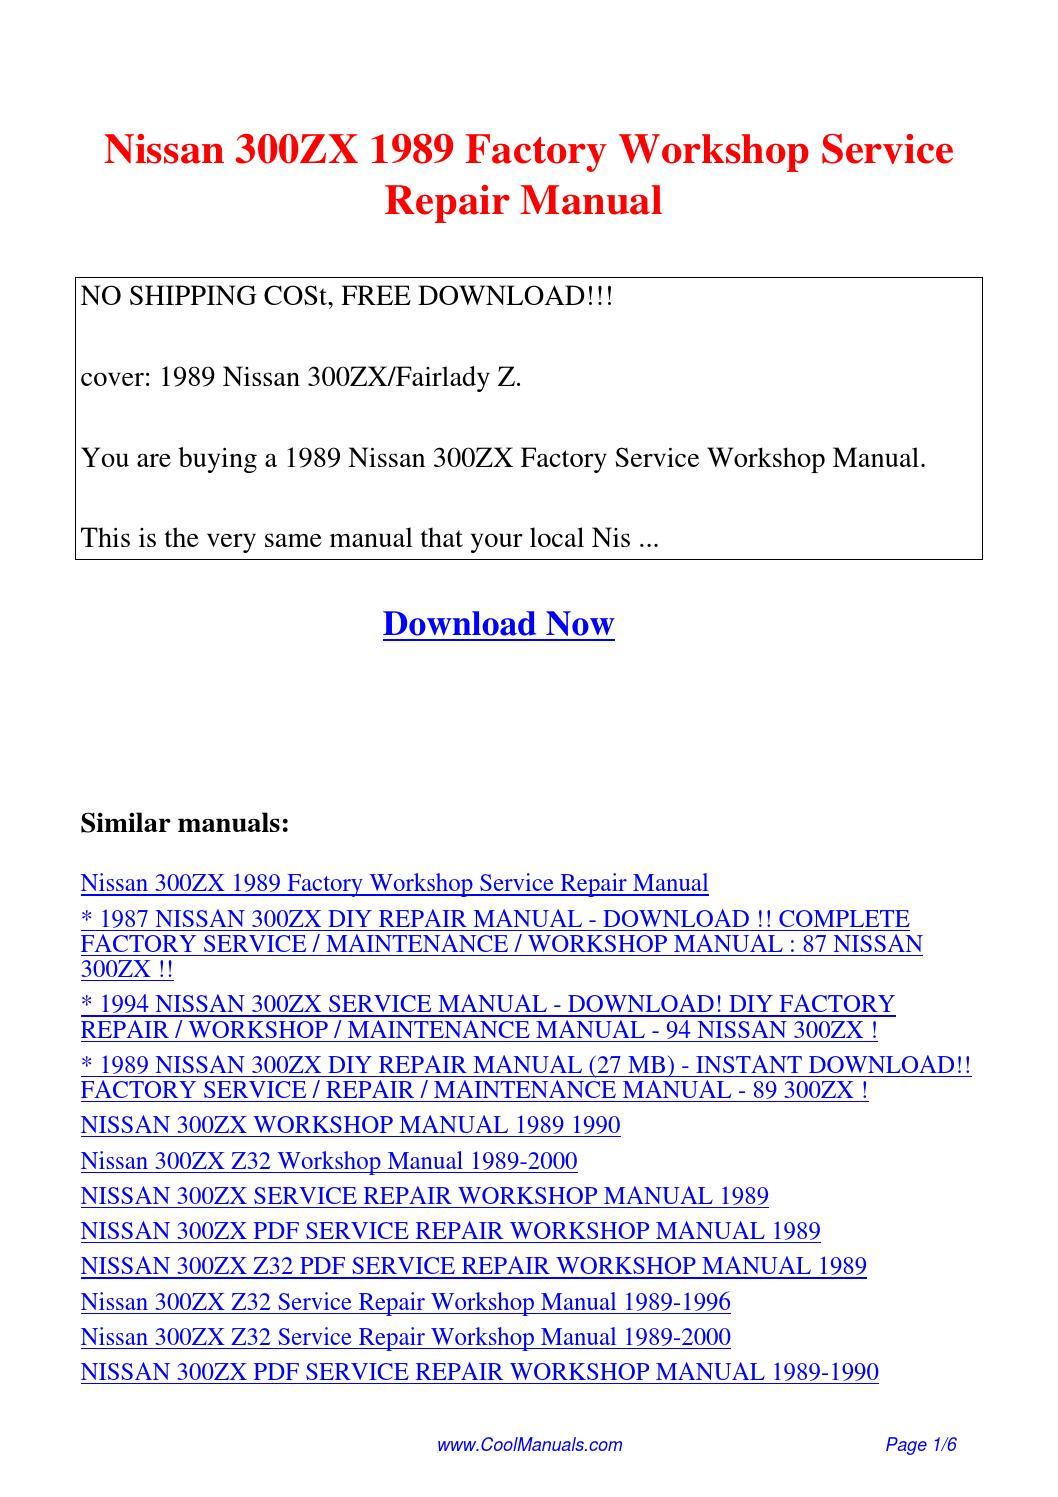 Nissan 300ZX 1989 Factory Workshop Service Repair Manual.pdf by Linda Pong  - issuu